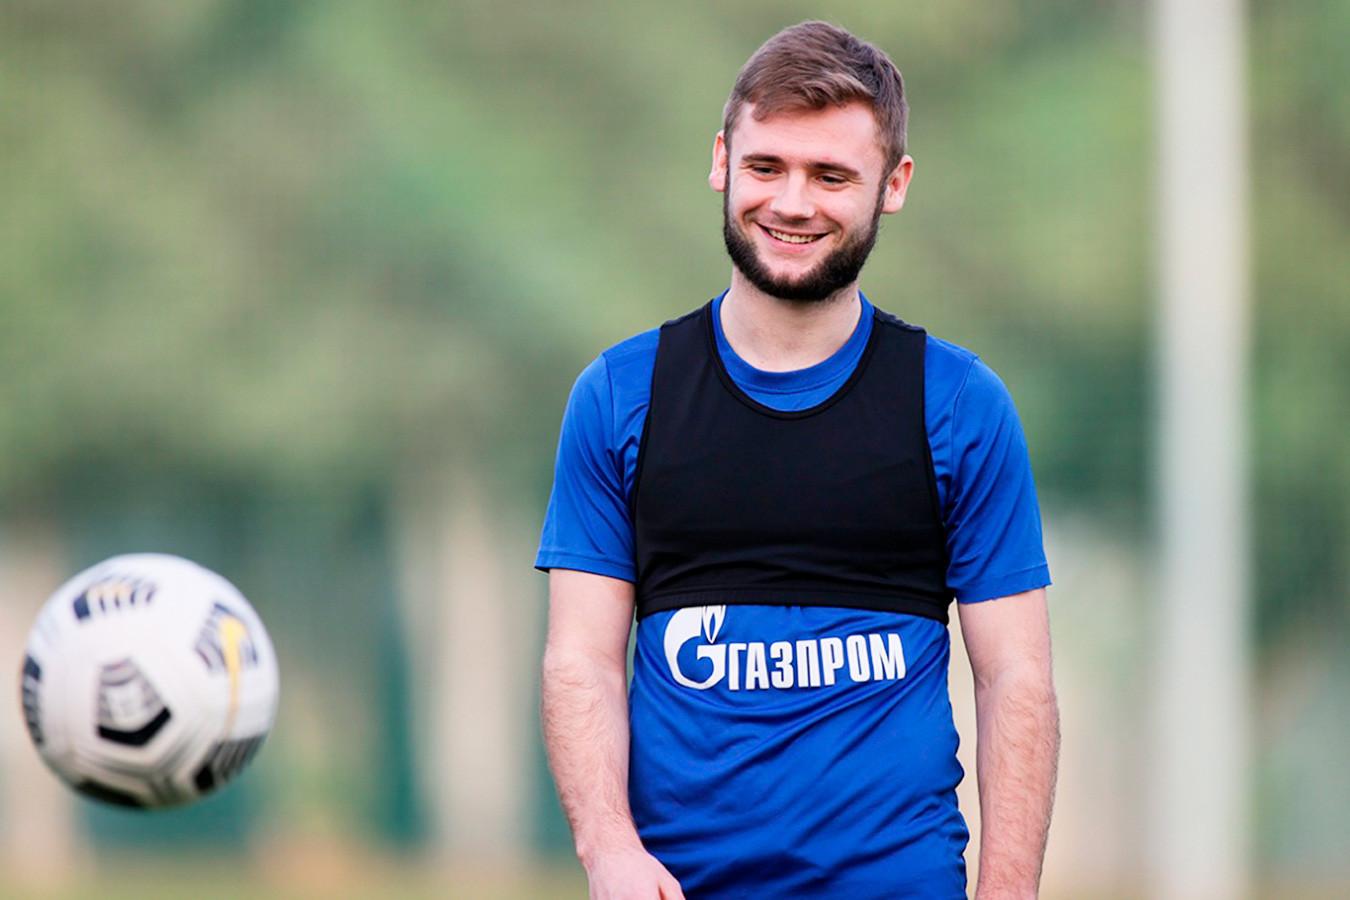 Нападающий «Зенита» Погорелов: перед сном мог представить, как забиваю ЦСКА или «Спартаку»